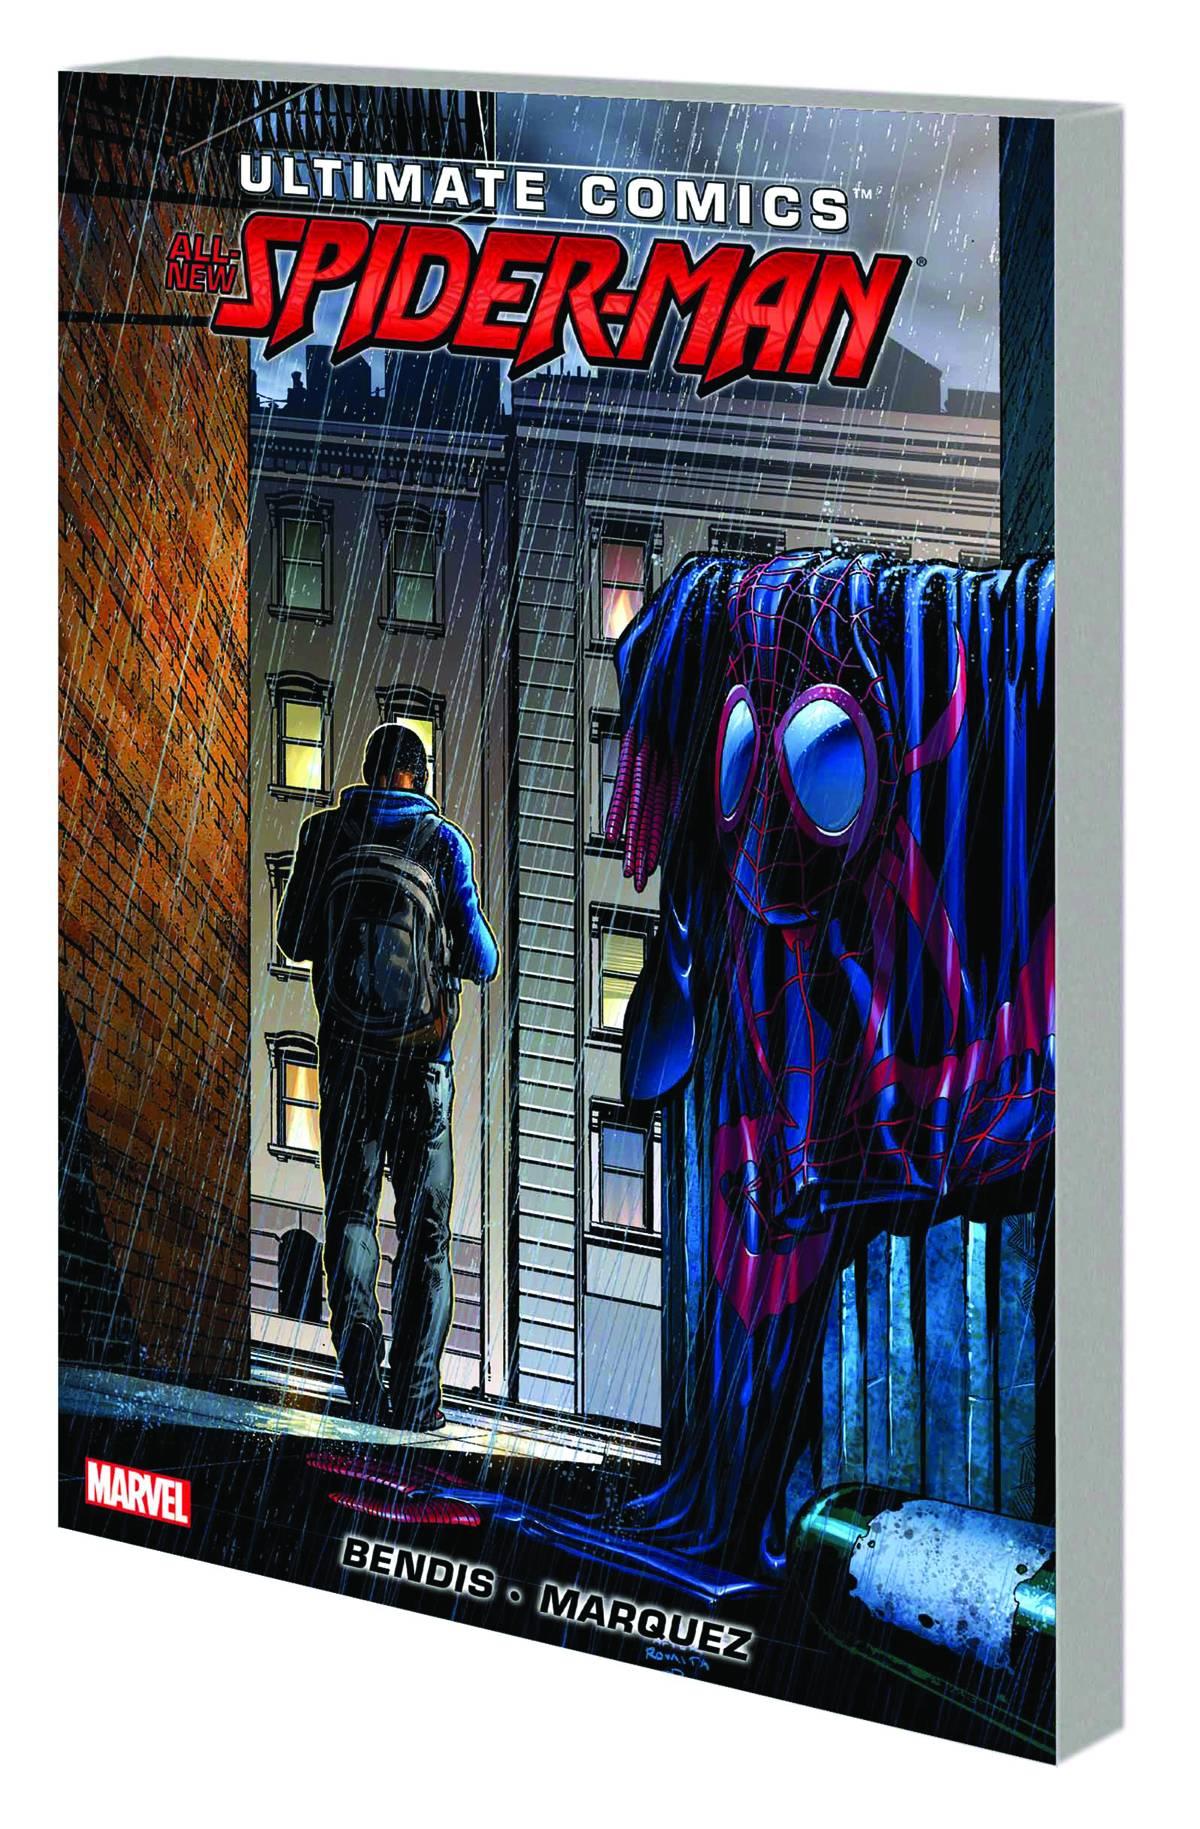 ULTIMATE COMICS SPIDER-MAN BY BENDIS PREM HC VOL 05